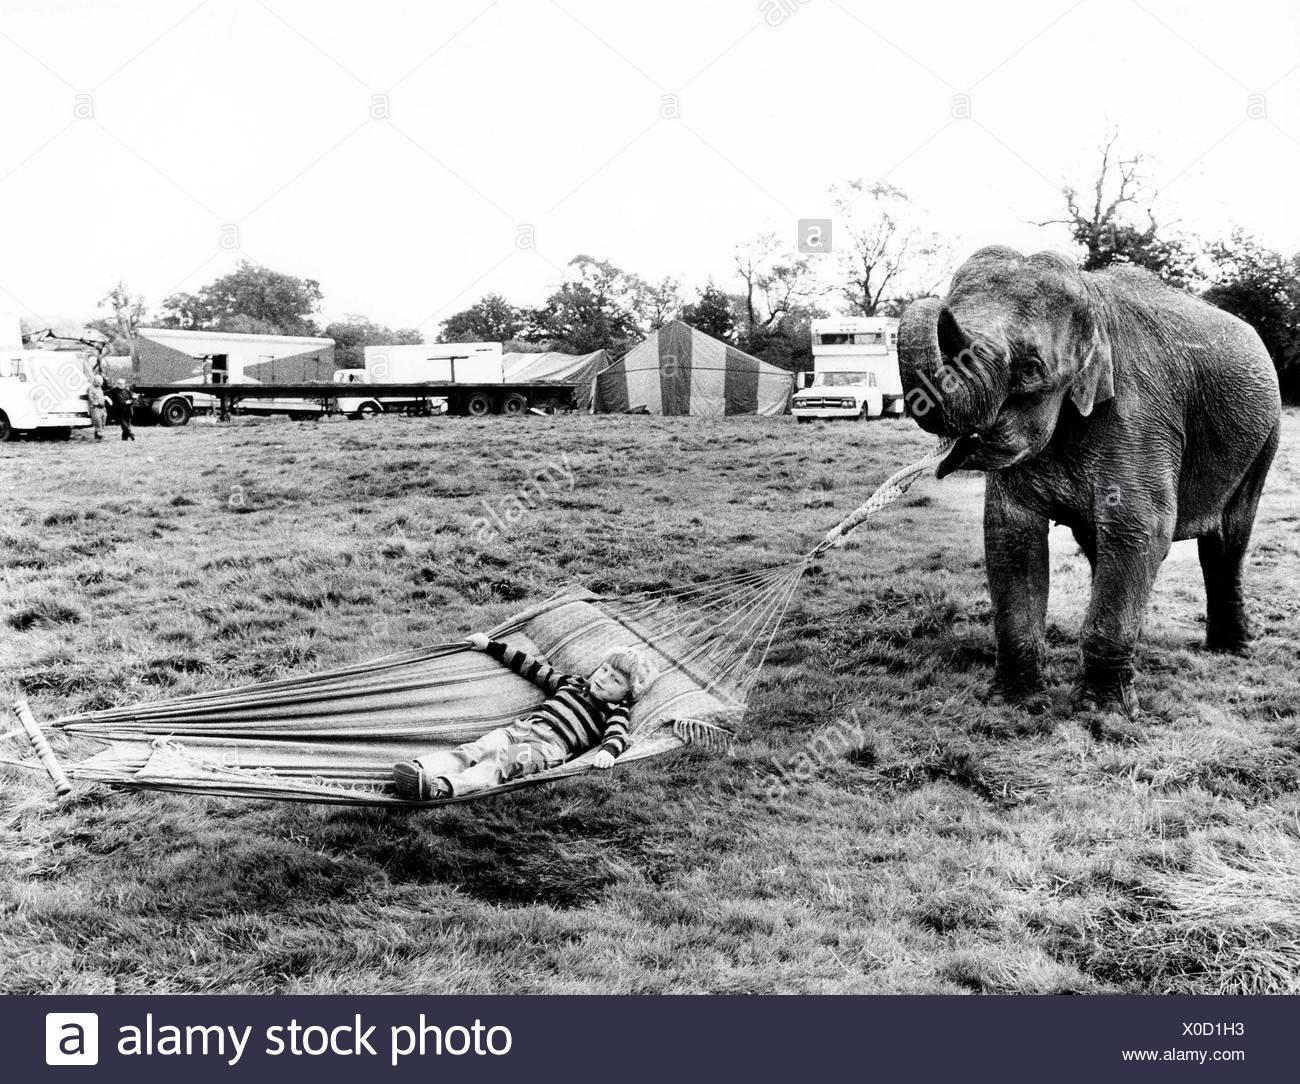 Elephant holds hammock, England, Great Britain - Stock Image